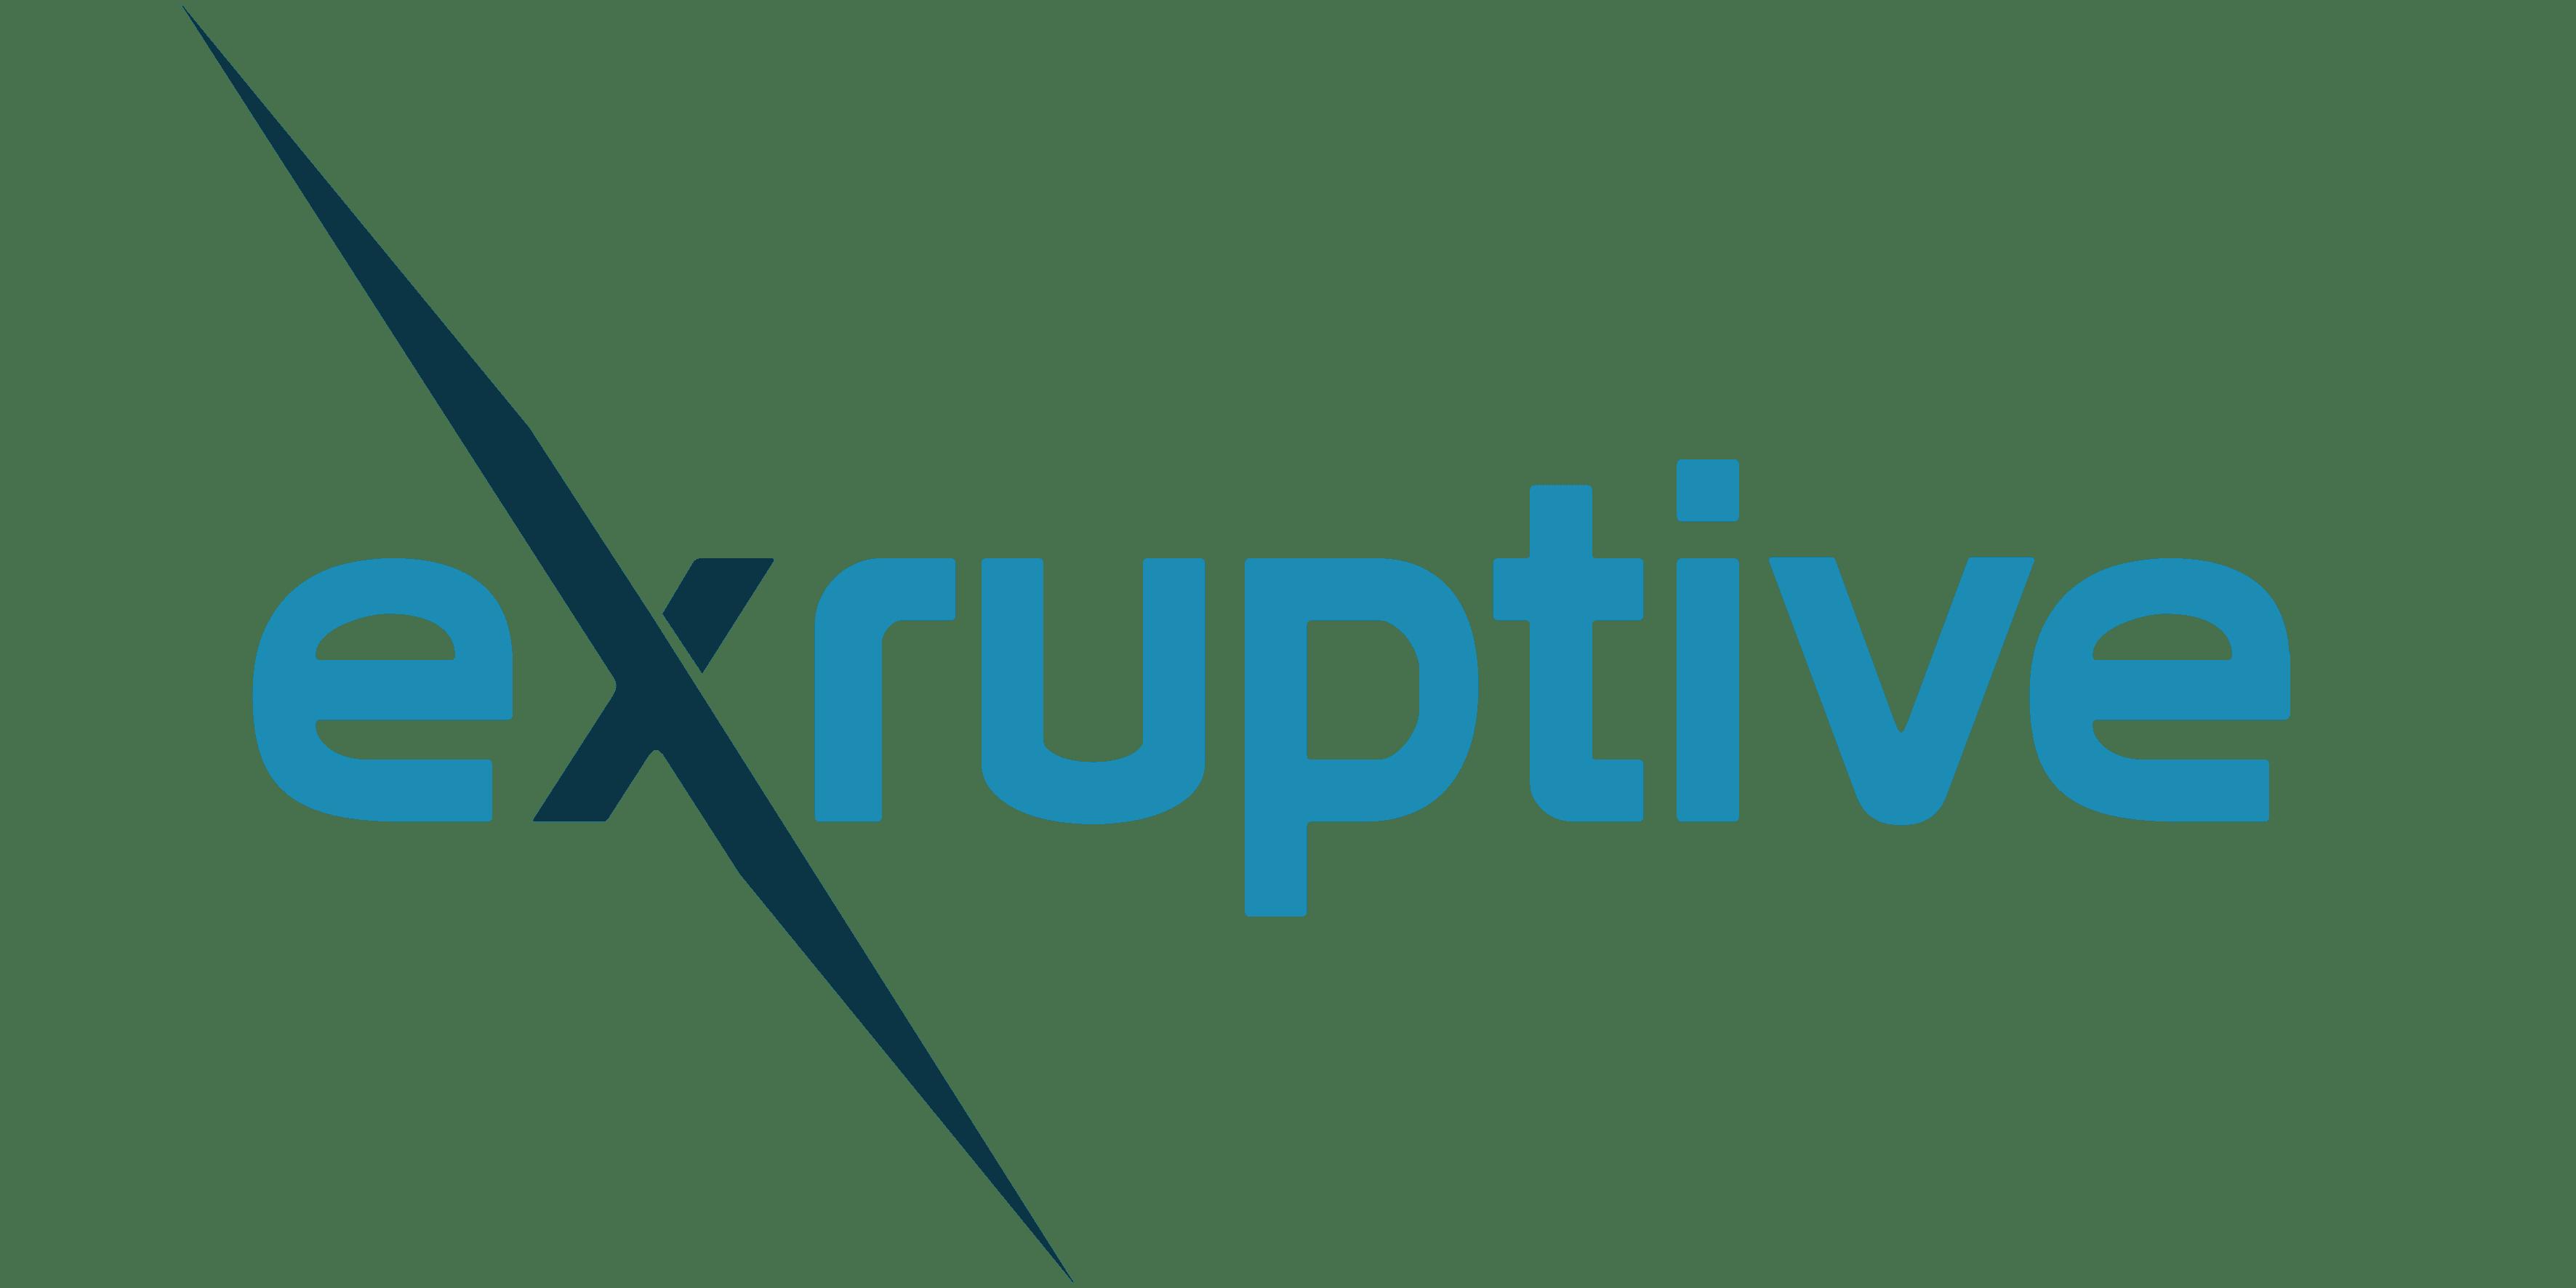 Exruptive logo